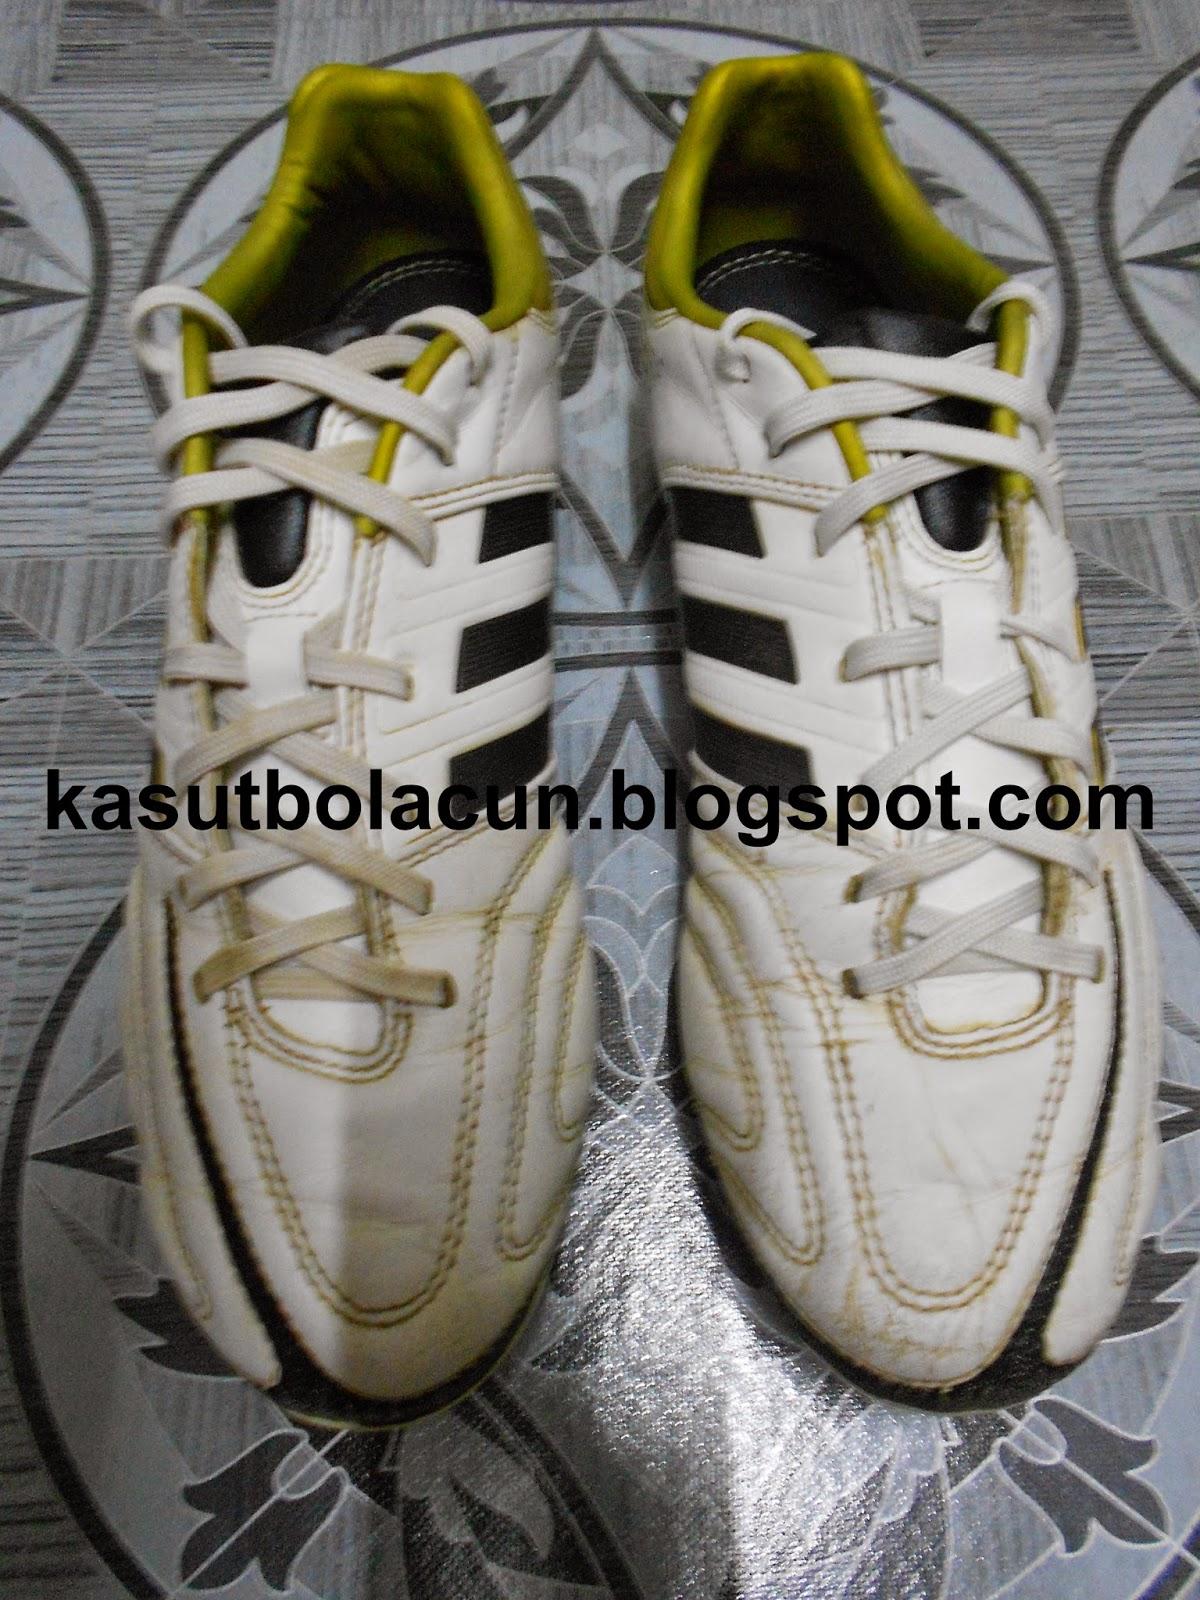 http://kasutbolacun.blogspot.com/2014/11/adidas-adipure-11pro-sg.html